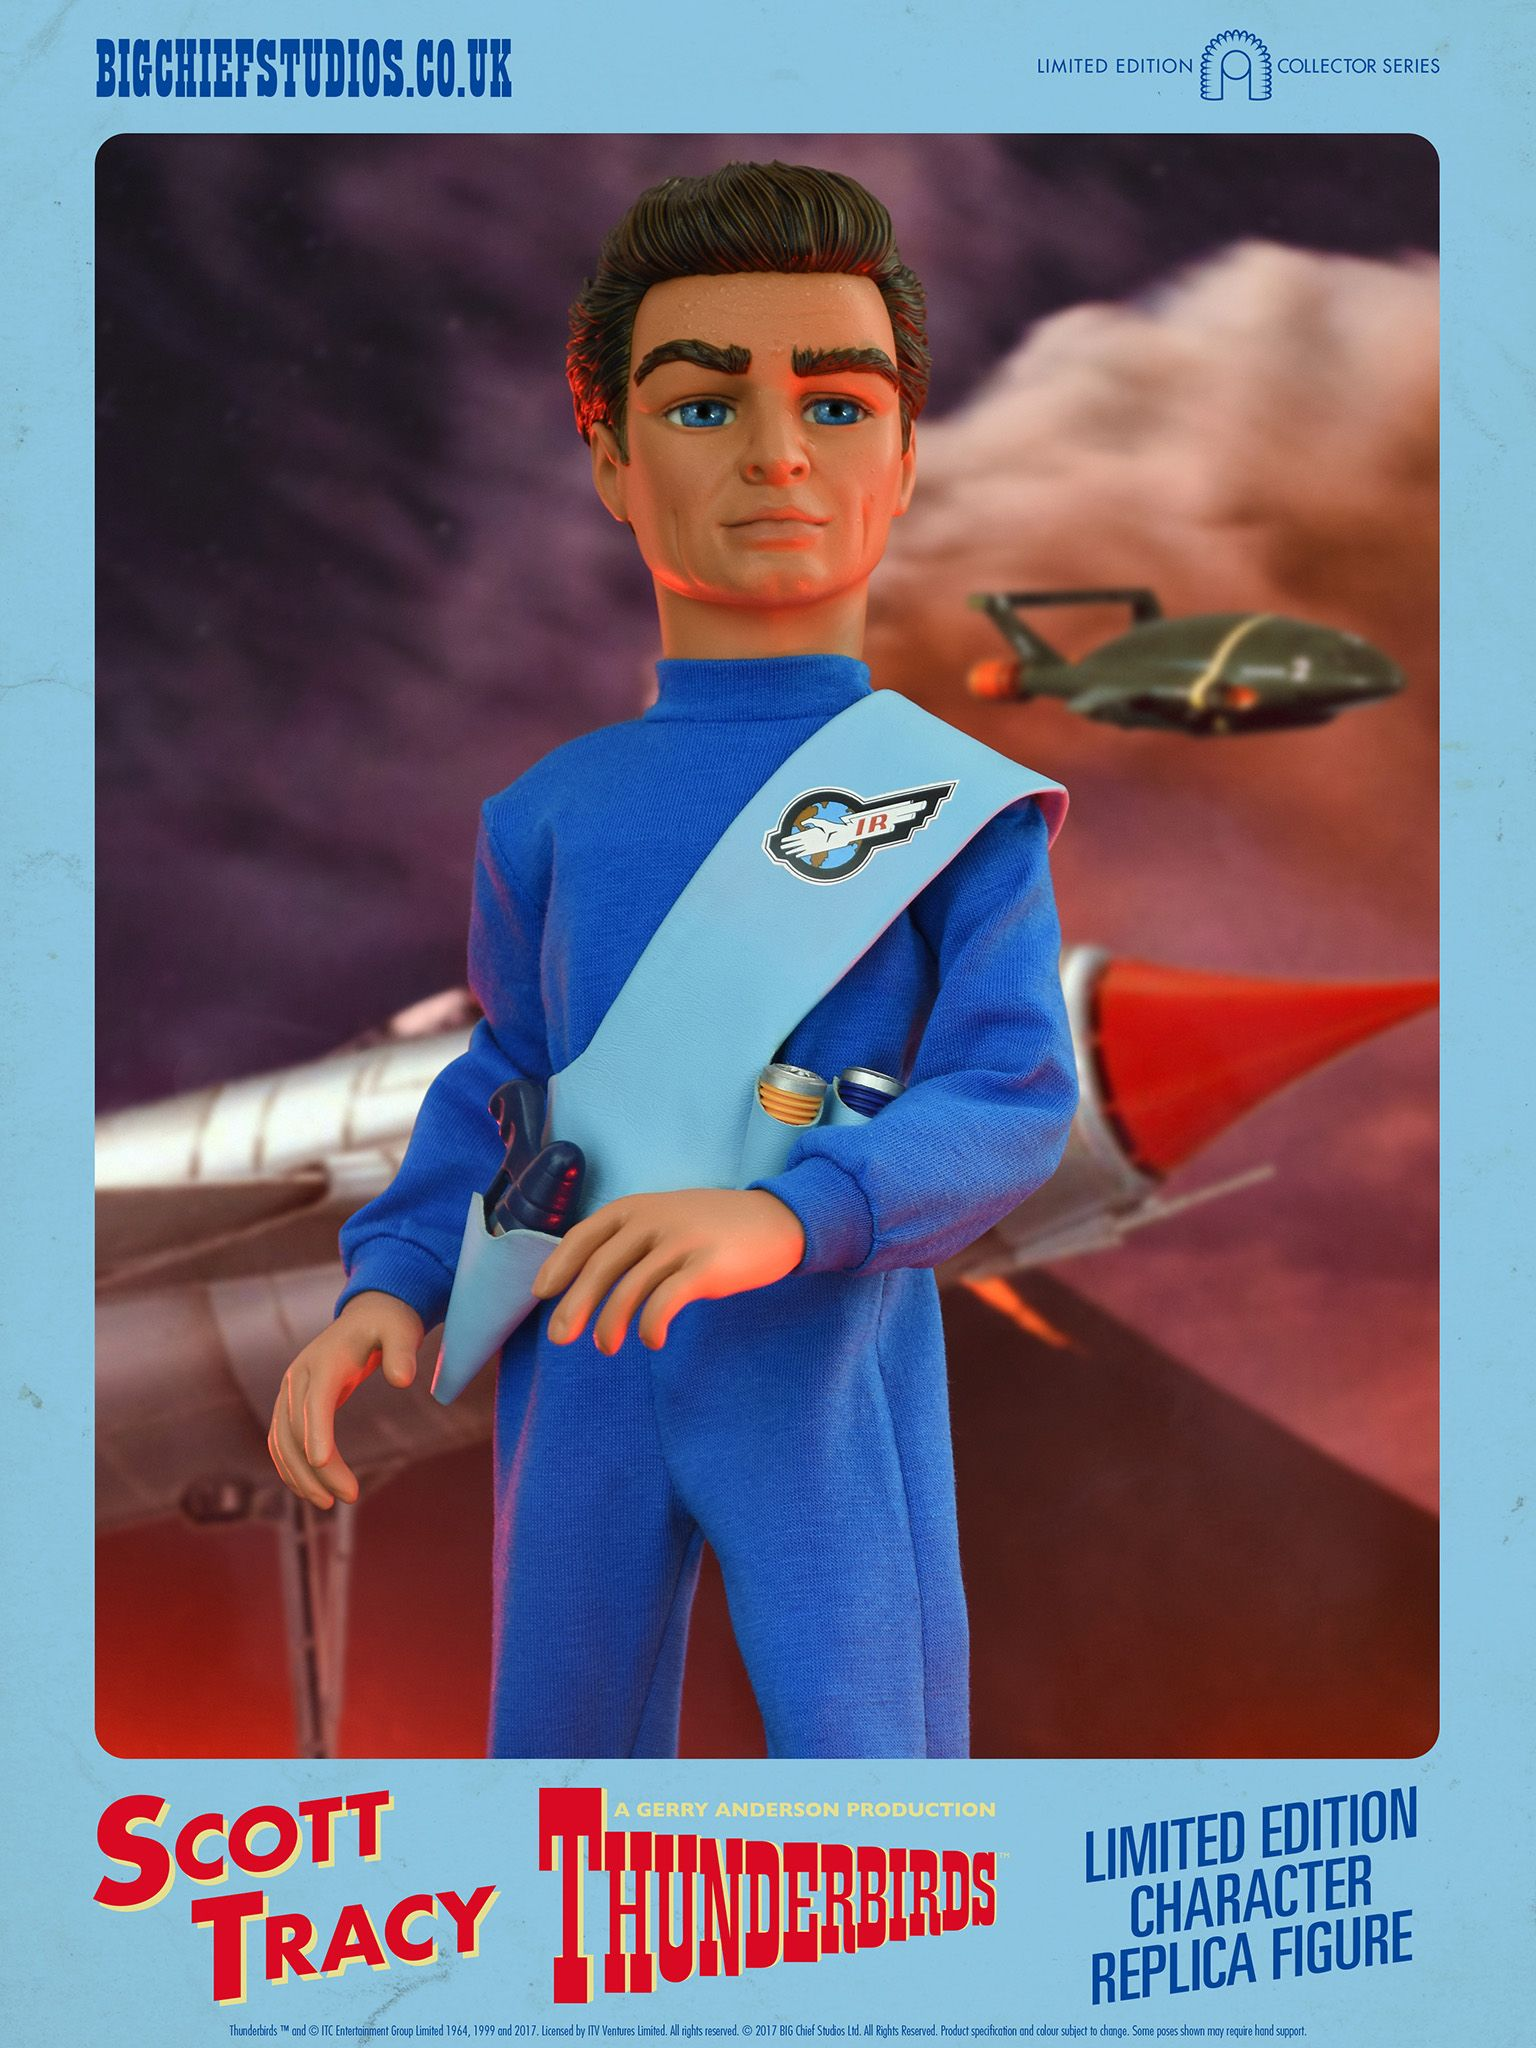 6 Scale Collectible Figure Scott Tracy 1 Big Chief Studios Thunderbirds